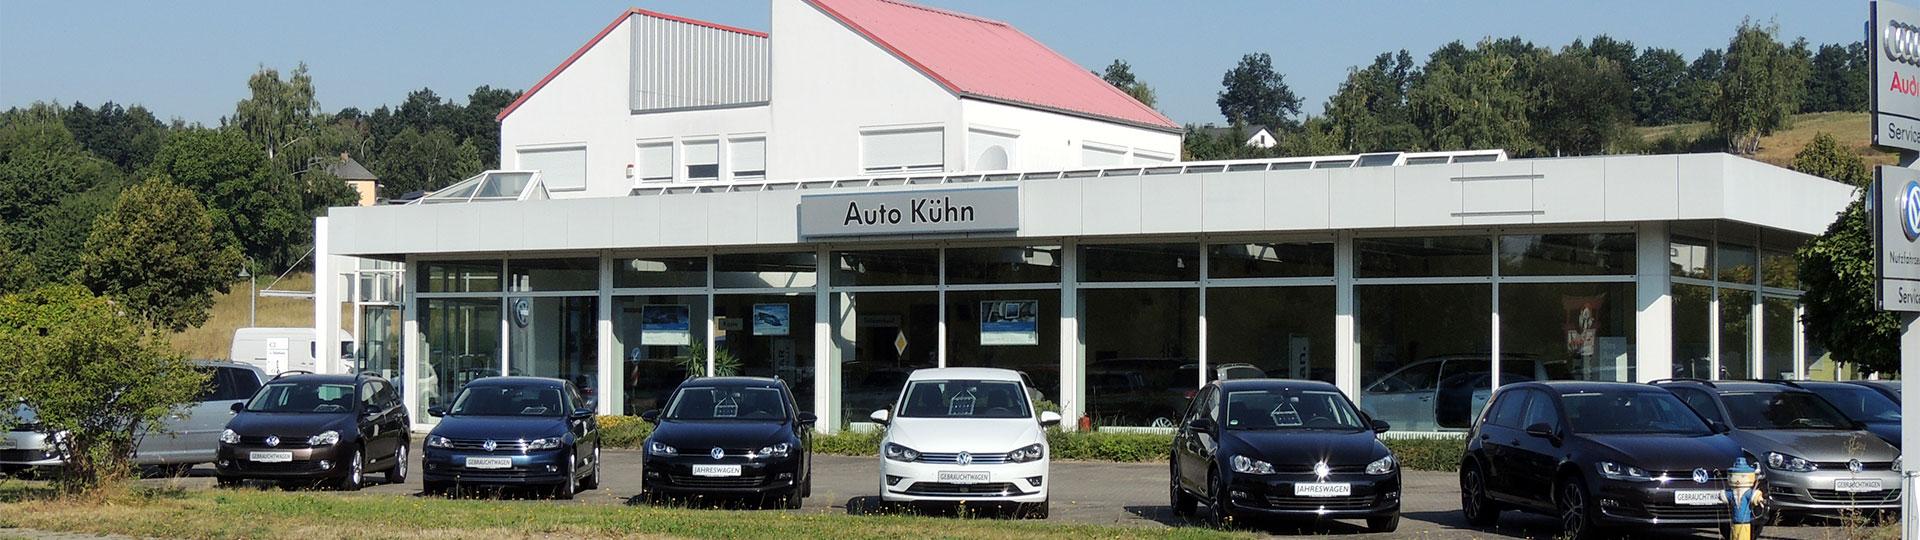 Auto K Hn Gmbh